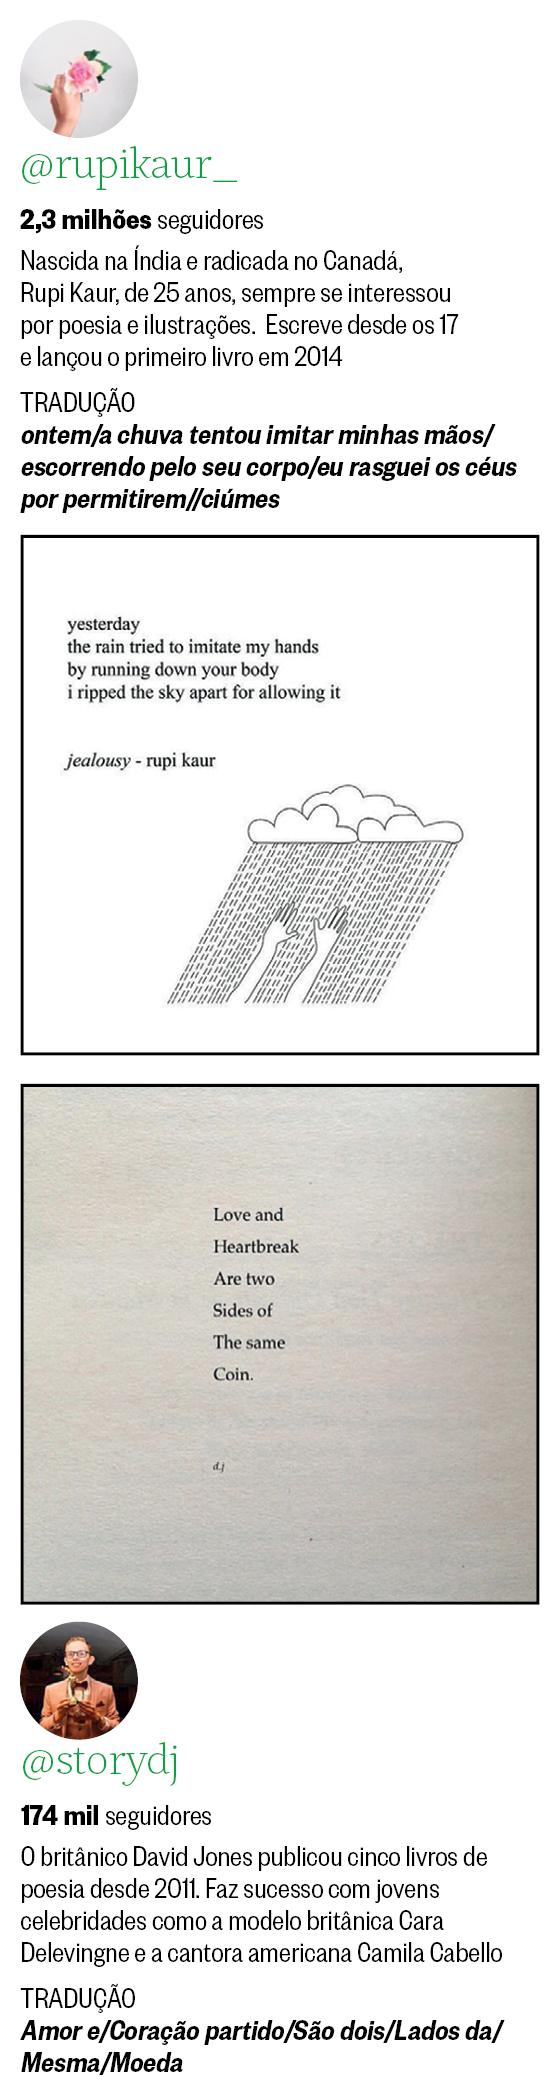 Poesias 2 (Foto: Época)